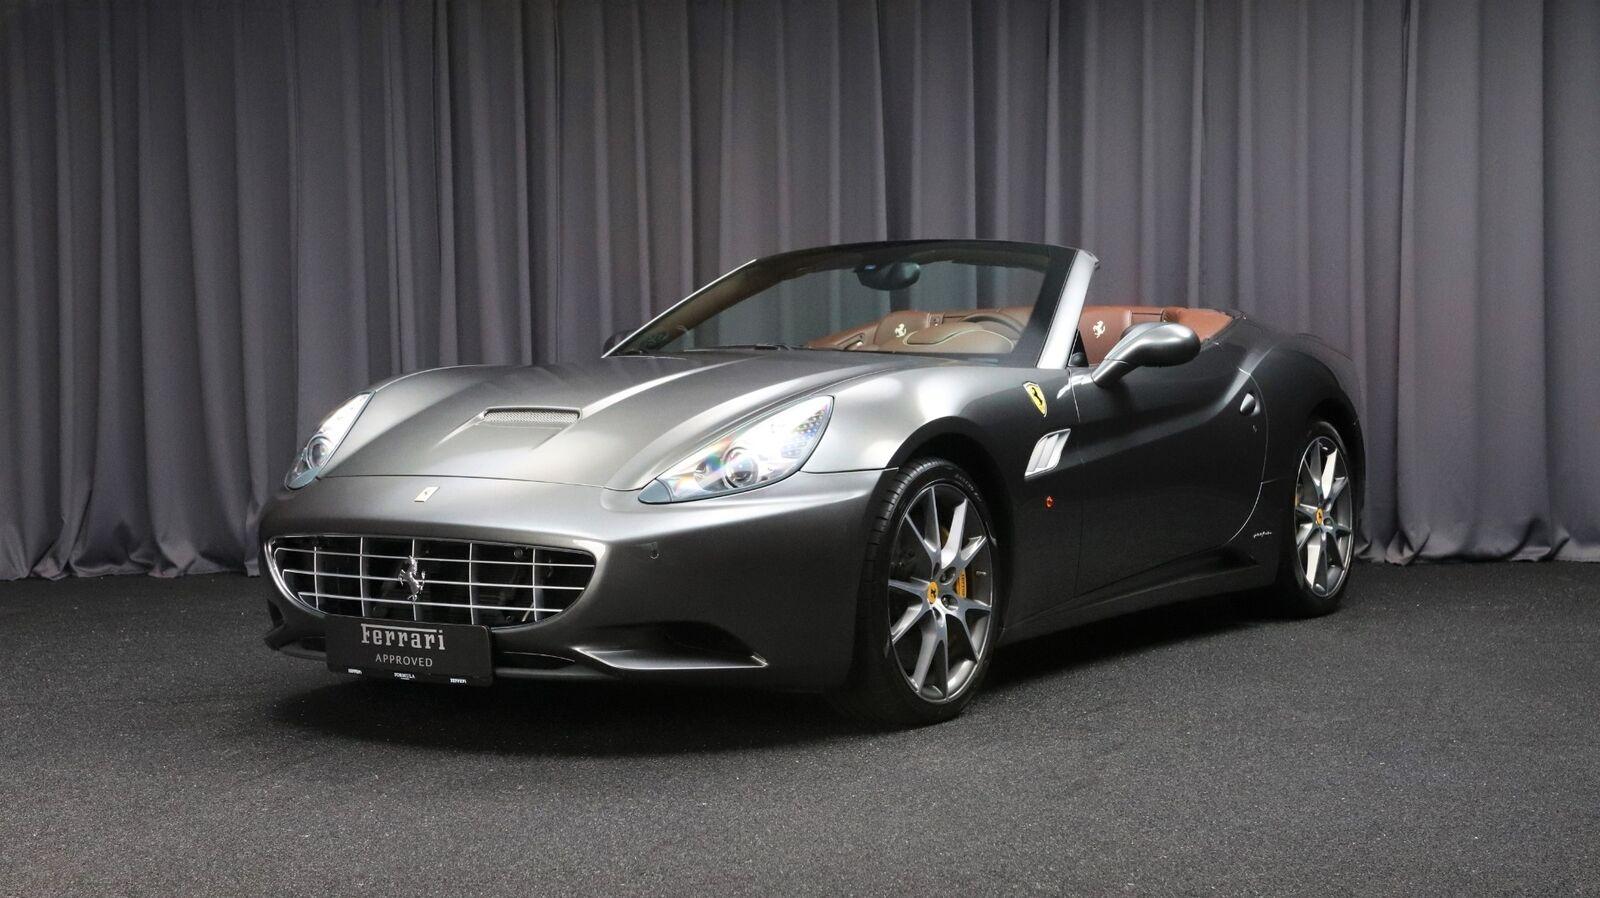 Ferrari California 30 4,3 F1 2d - 8.995 kr.